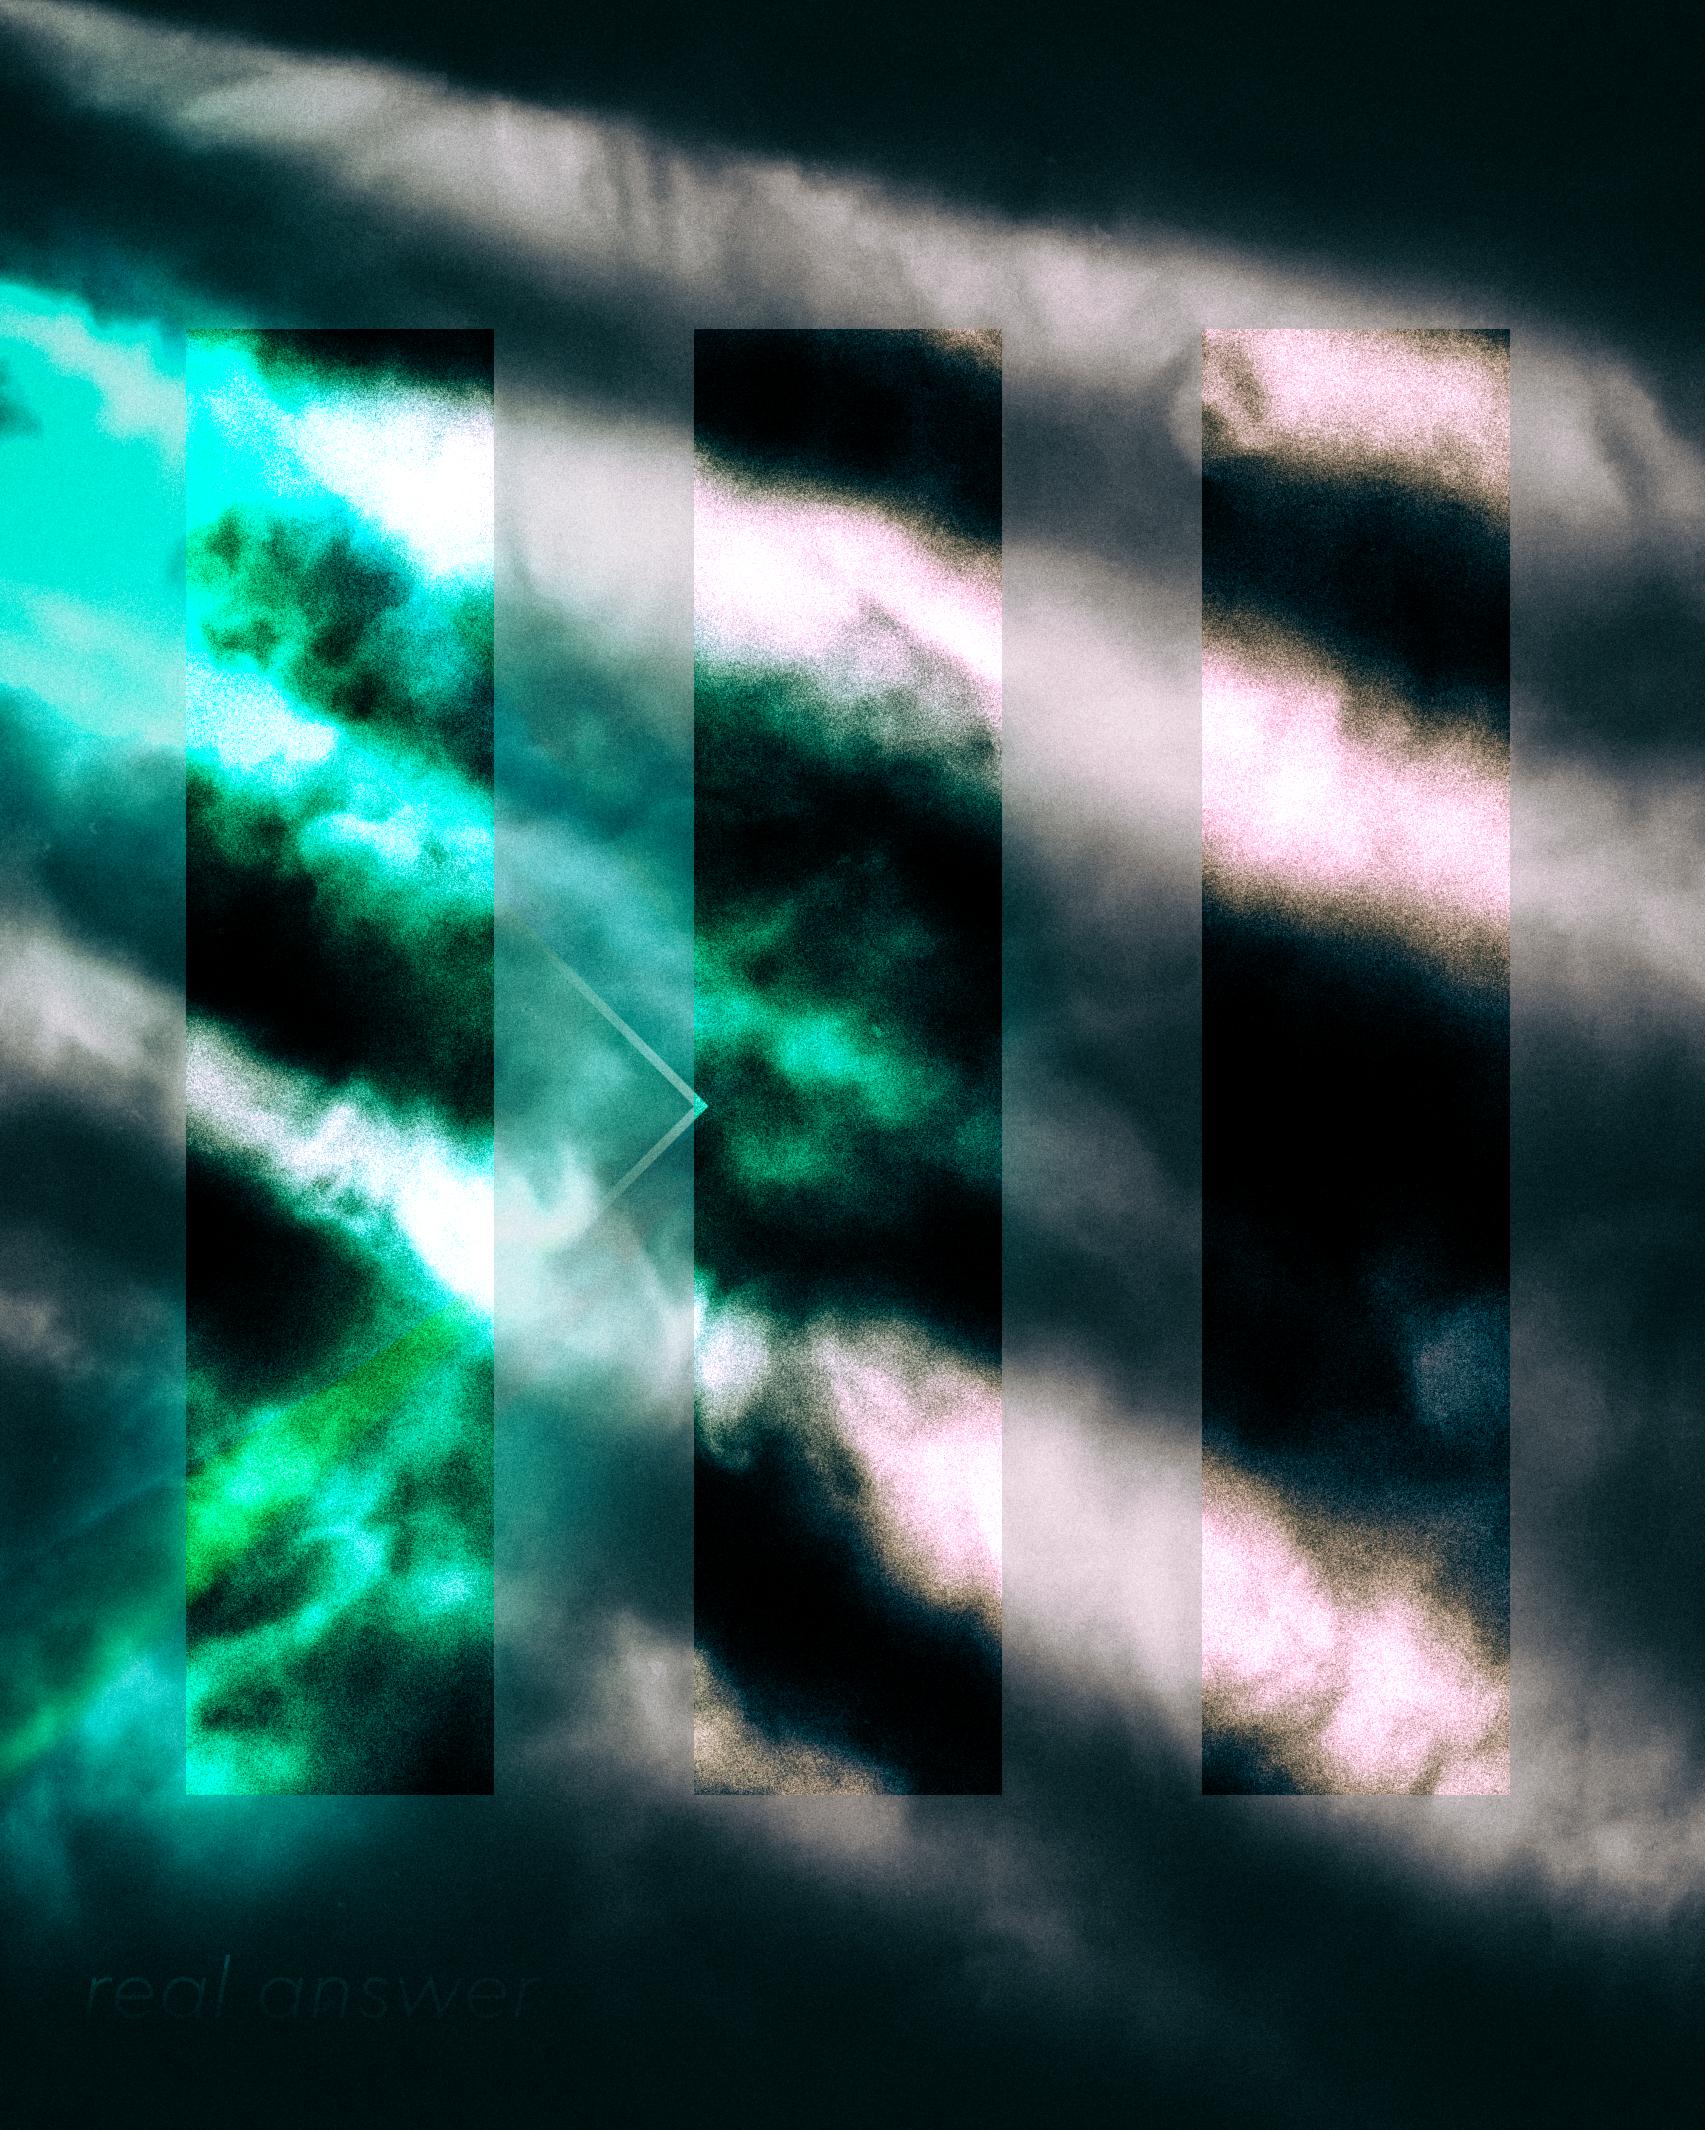 Shine Through // Real Answer - 21-08-18